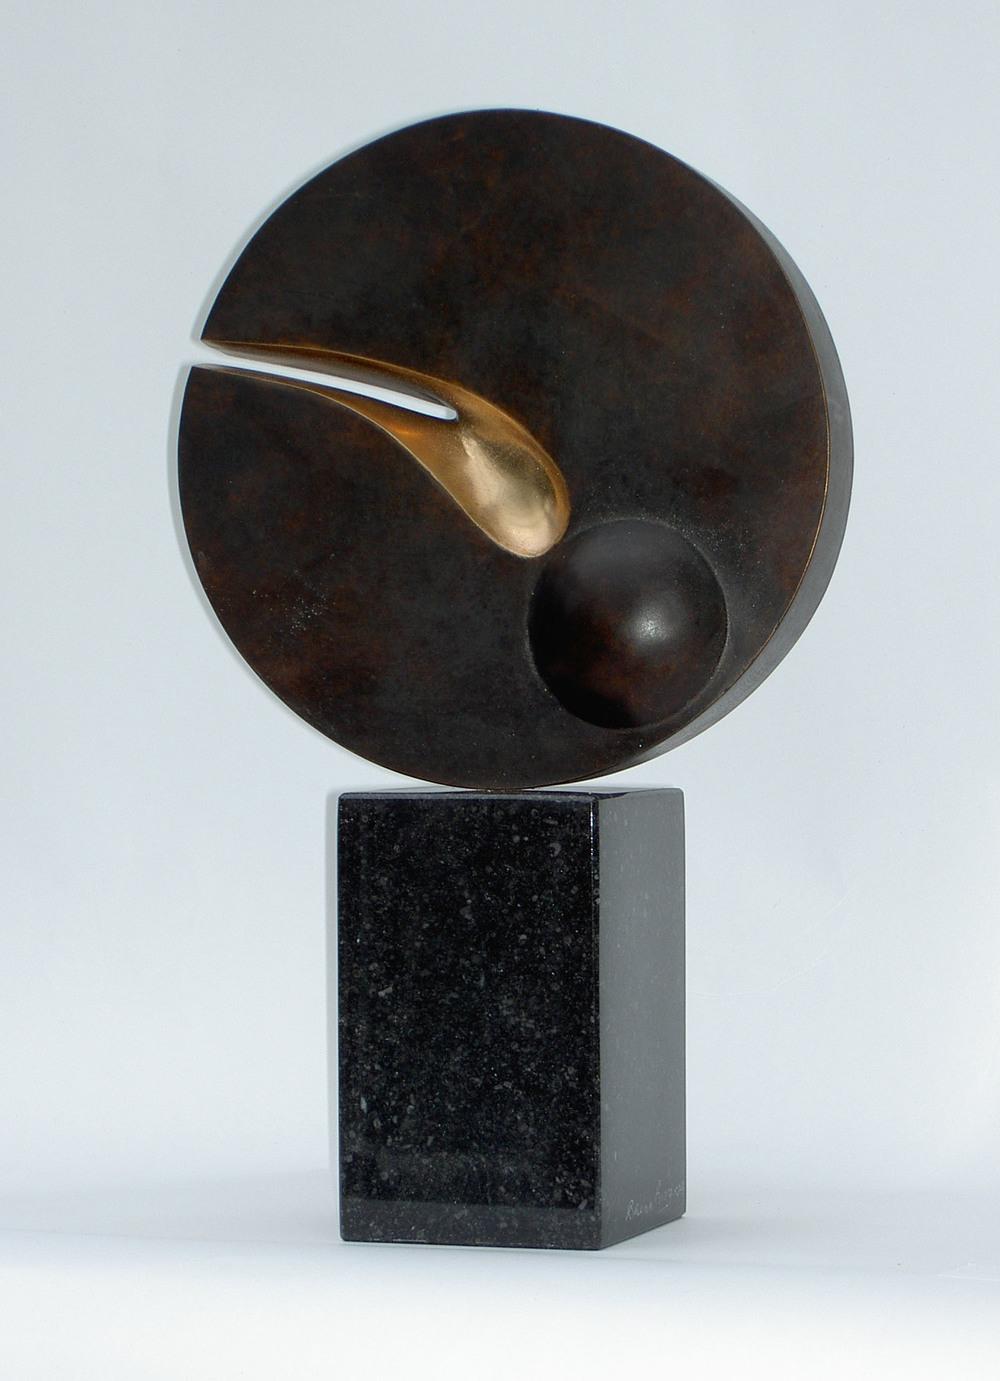 Brian King_-_Hailey's Comet_bronze, AP_36 x 21cm.jpg